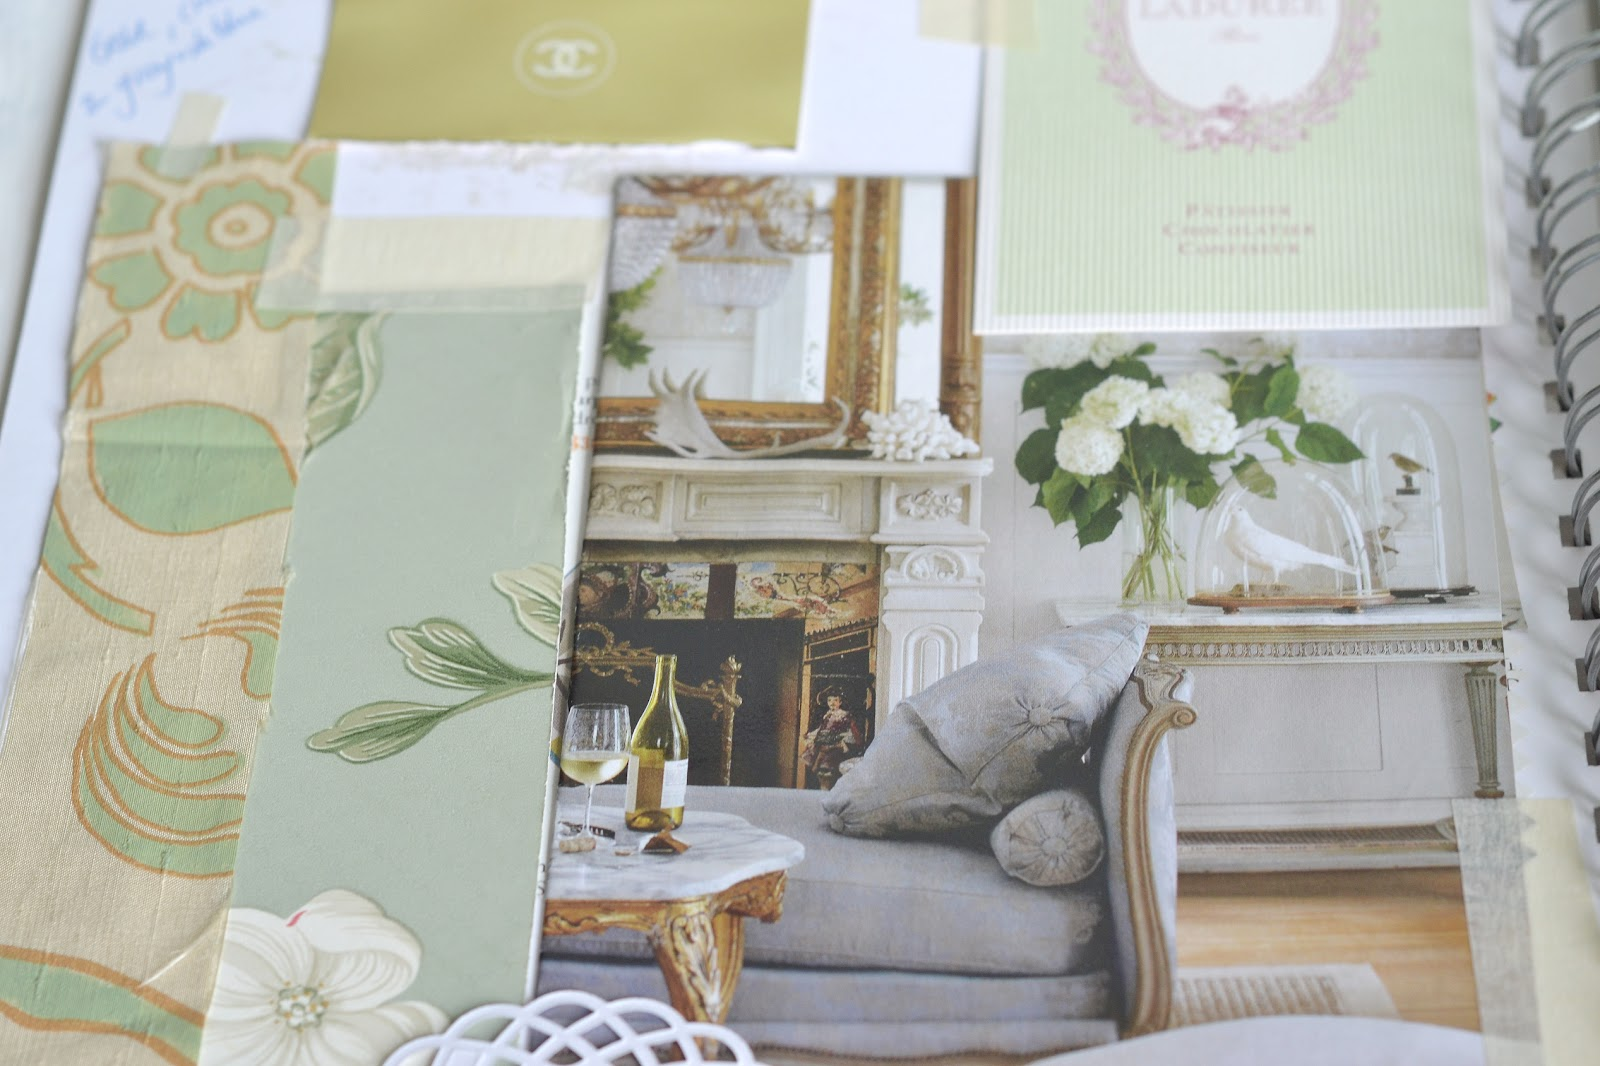 Curiositaellya september home interior collage journal for Interior journal